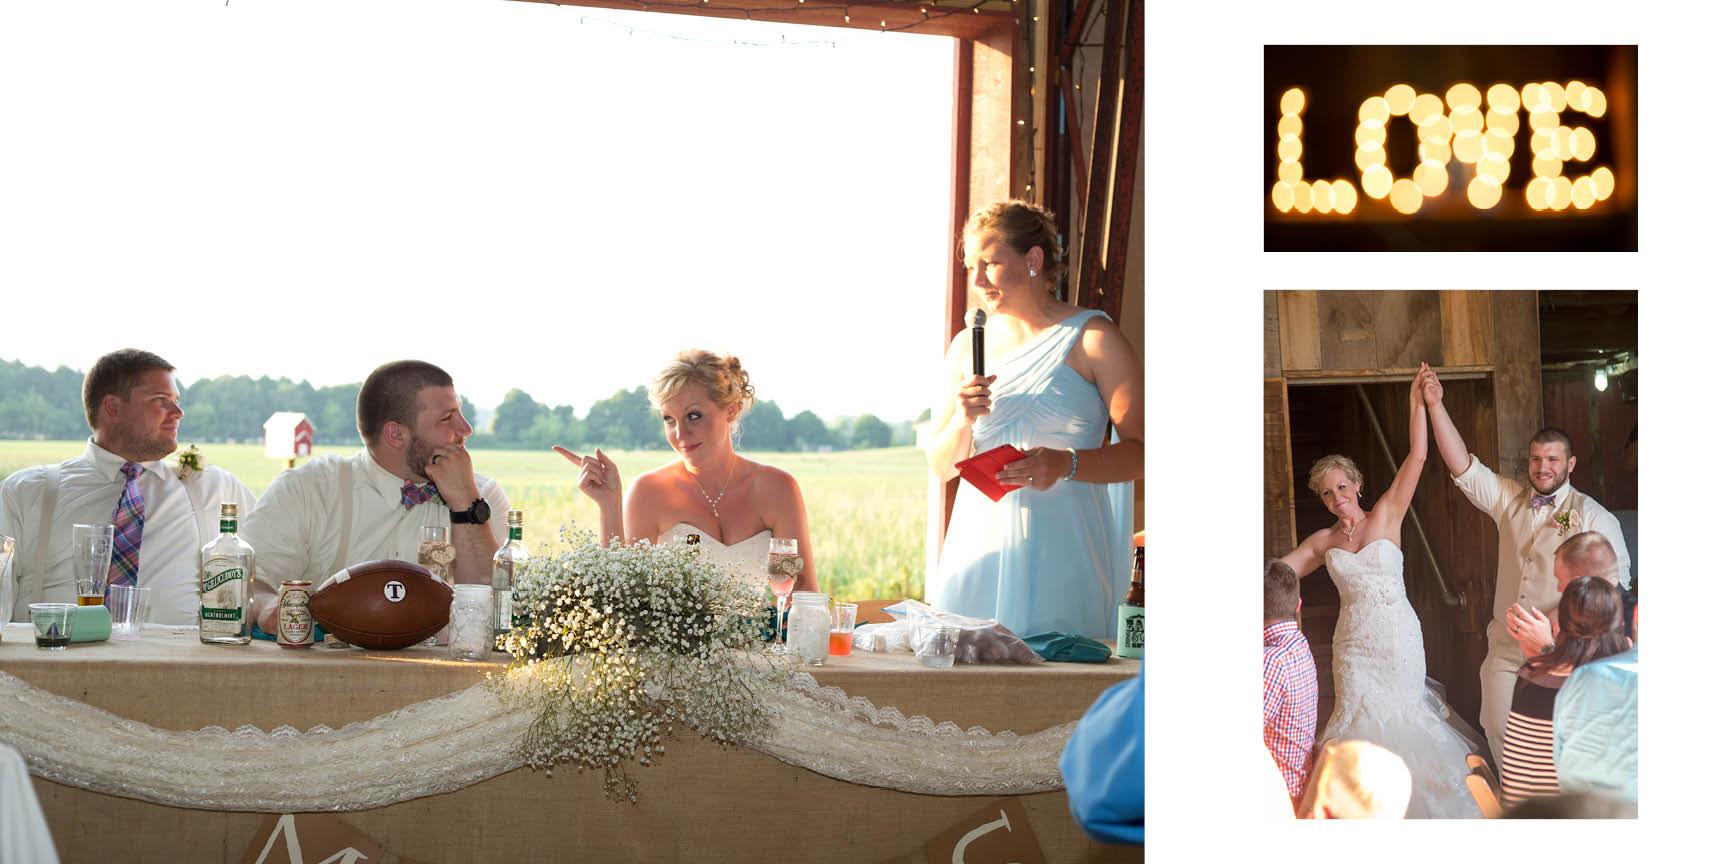 Ann Arbor wedding photographer captures the reception excitement.